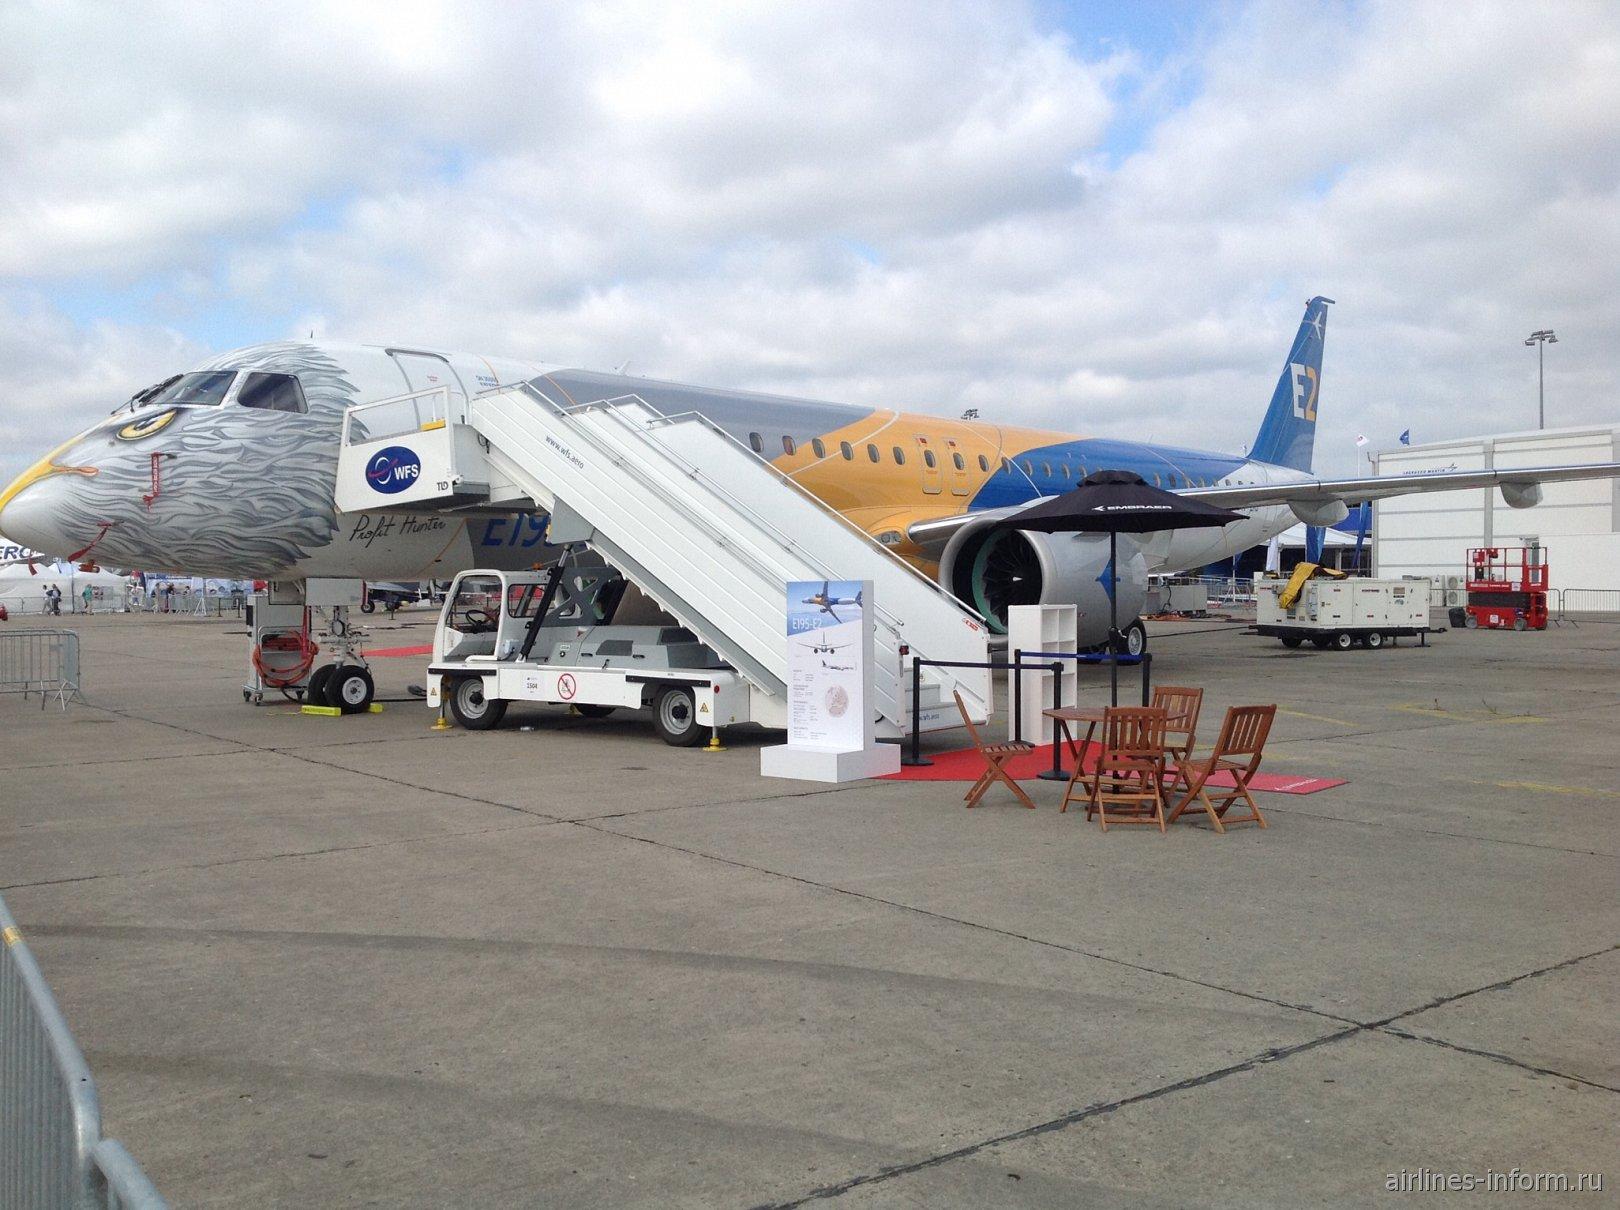 Самолет Embraer 195-E2 на авиасалоне в Ле-Бурже